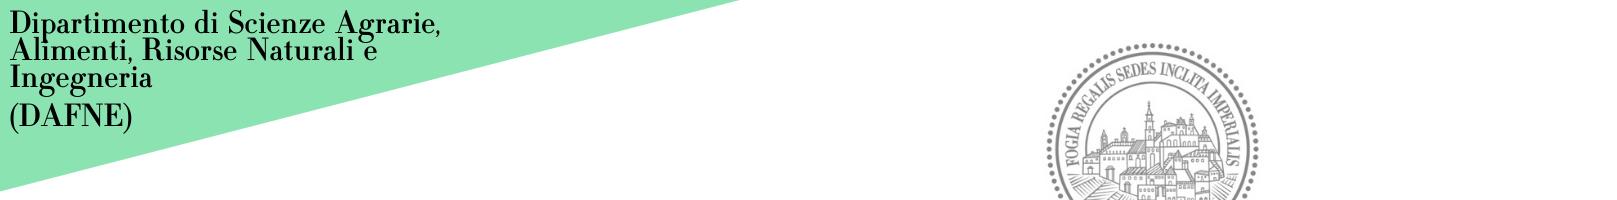 Banner Dipartimento di Scienze Agrarie